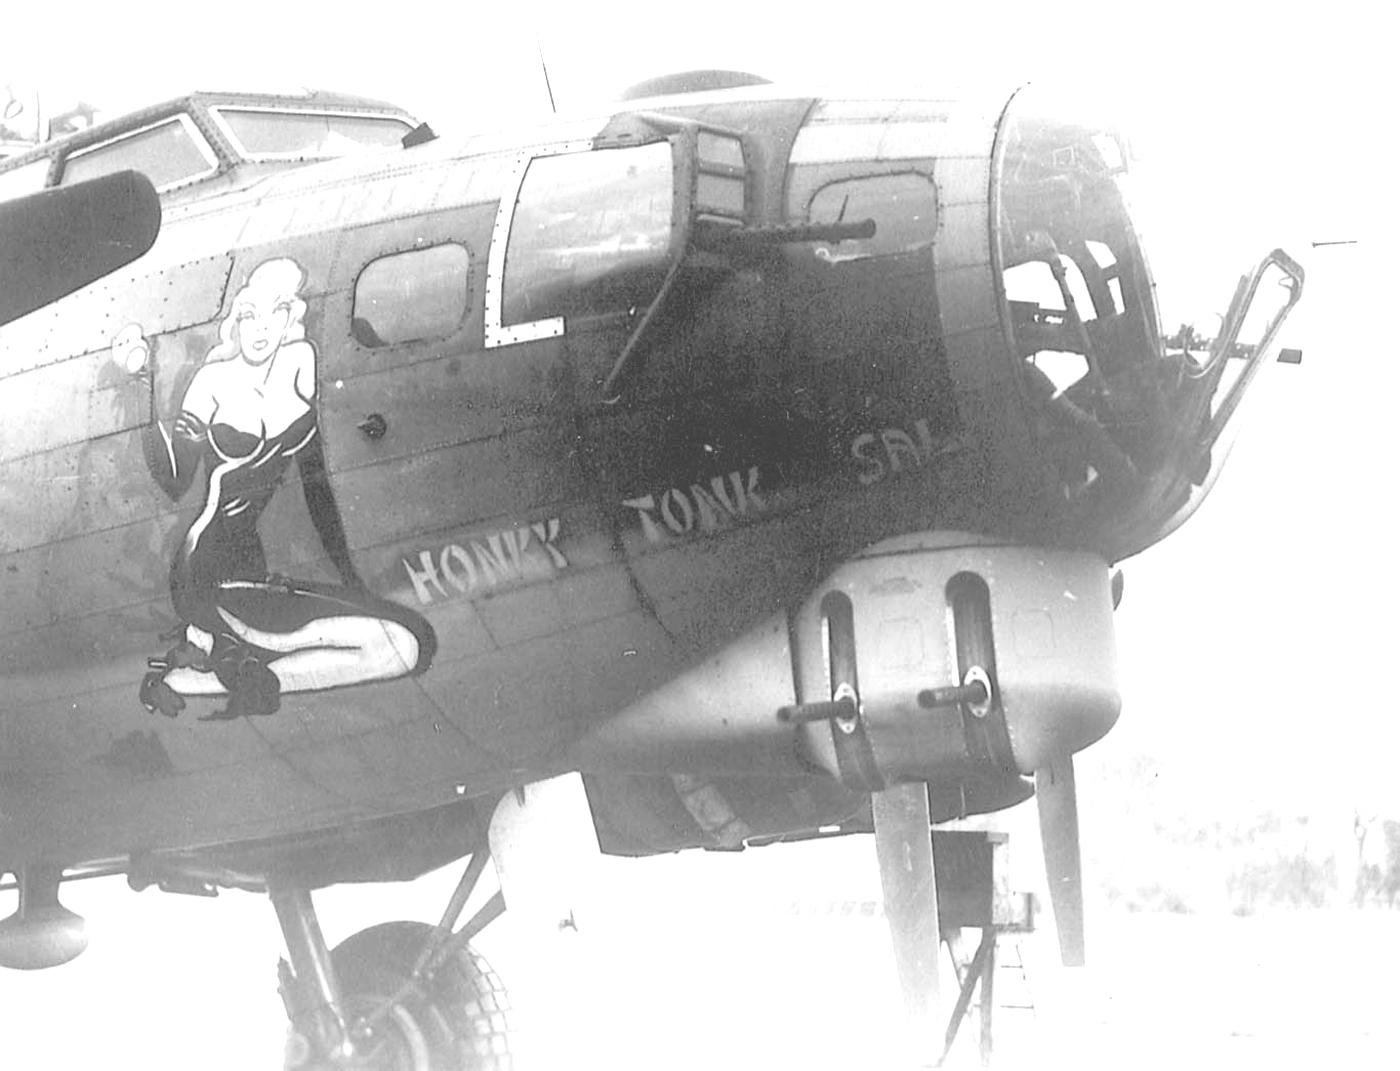 B-17 42-31335